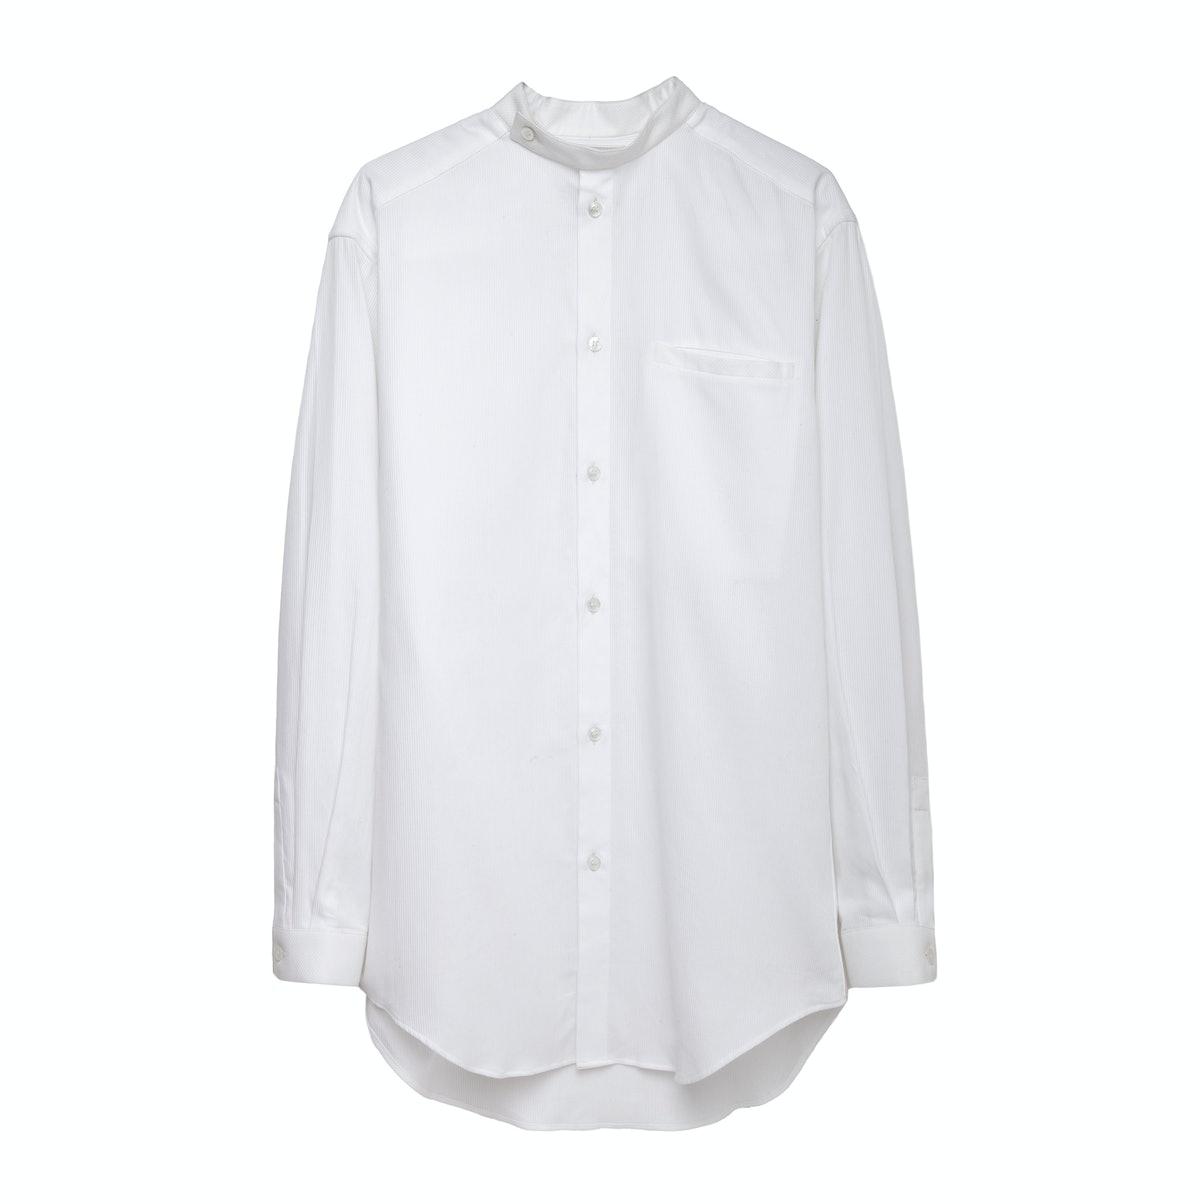 1205 shirt